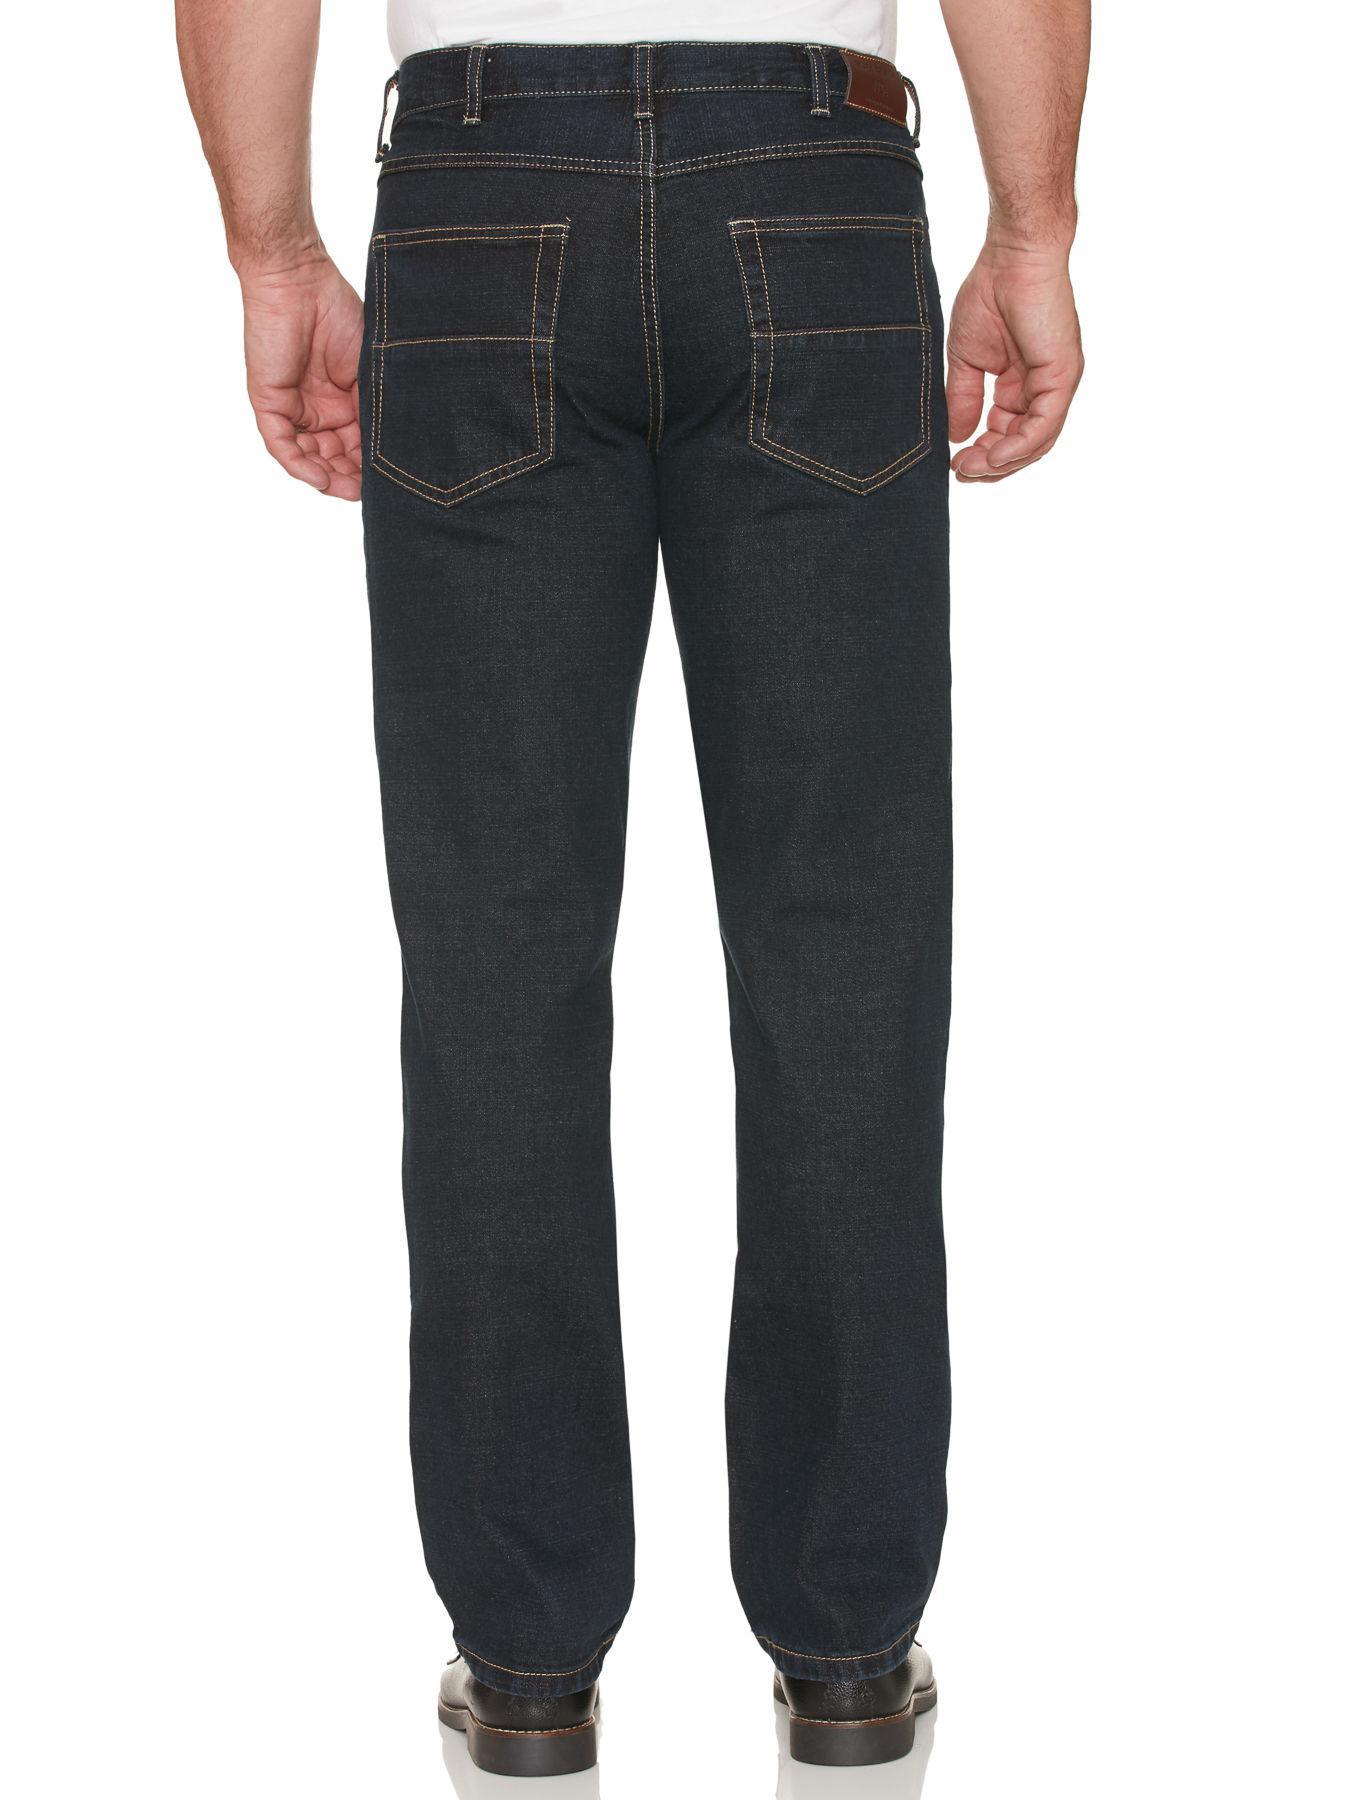 Farah The Darwood Rigid Denim Trouser in Indigo Blue (Blue) for Men